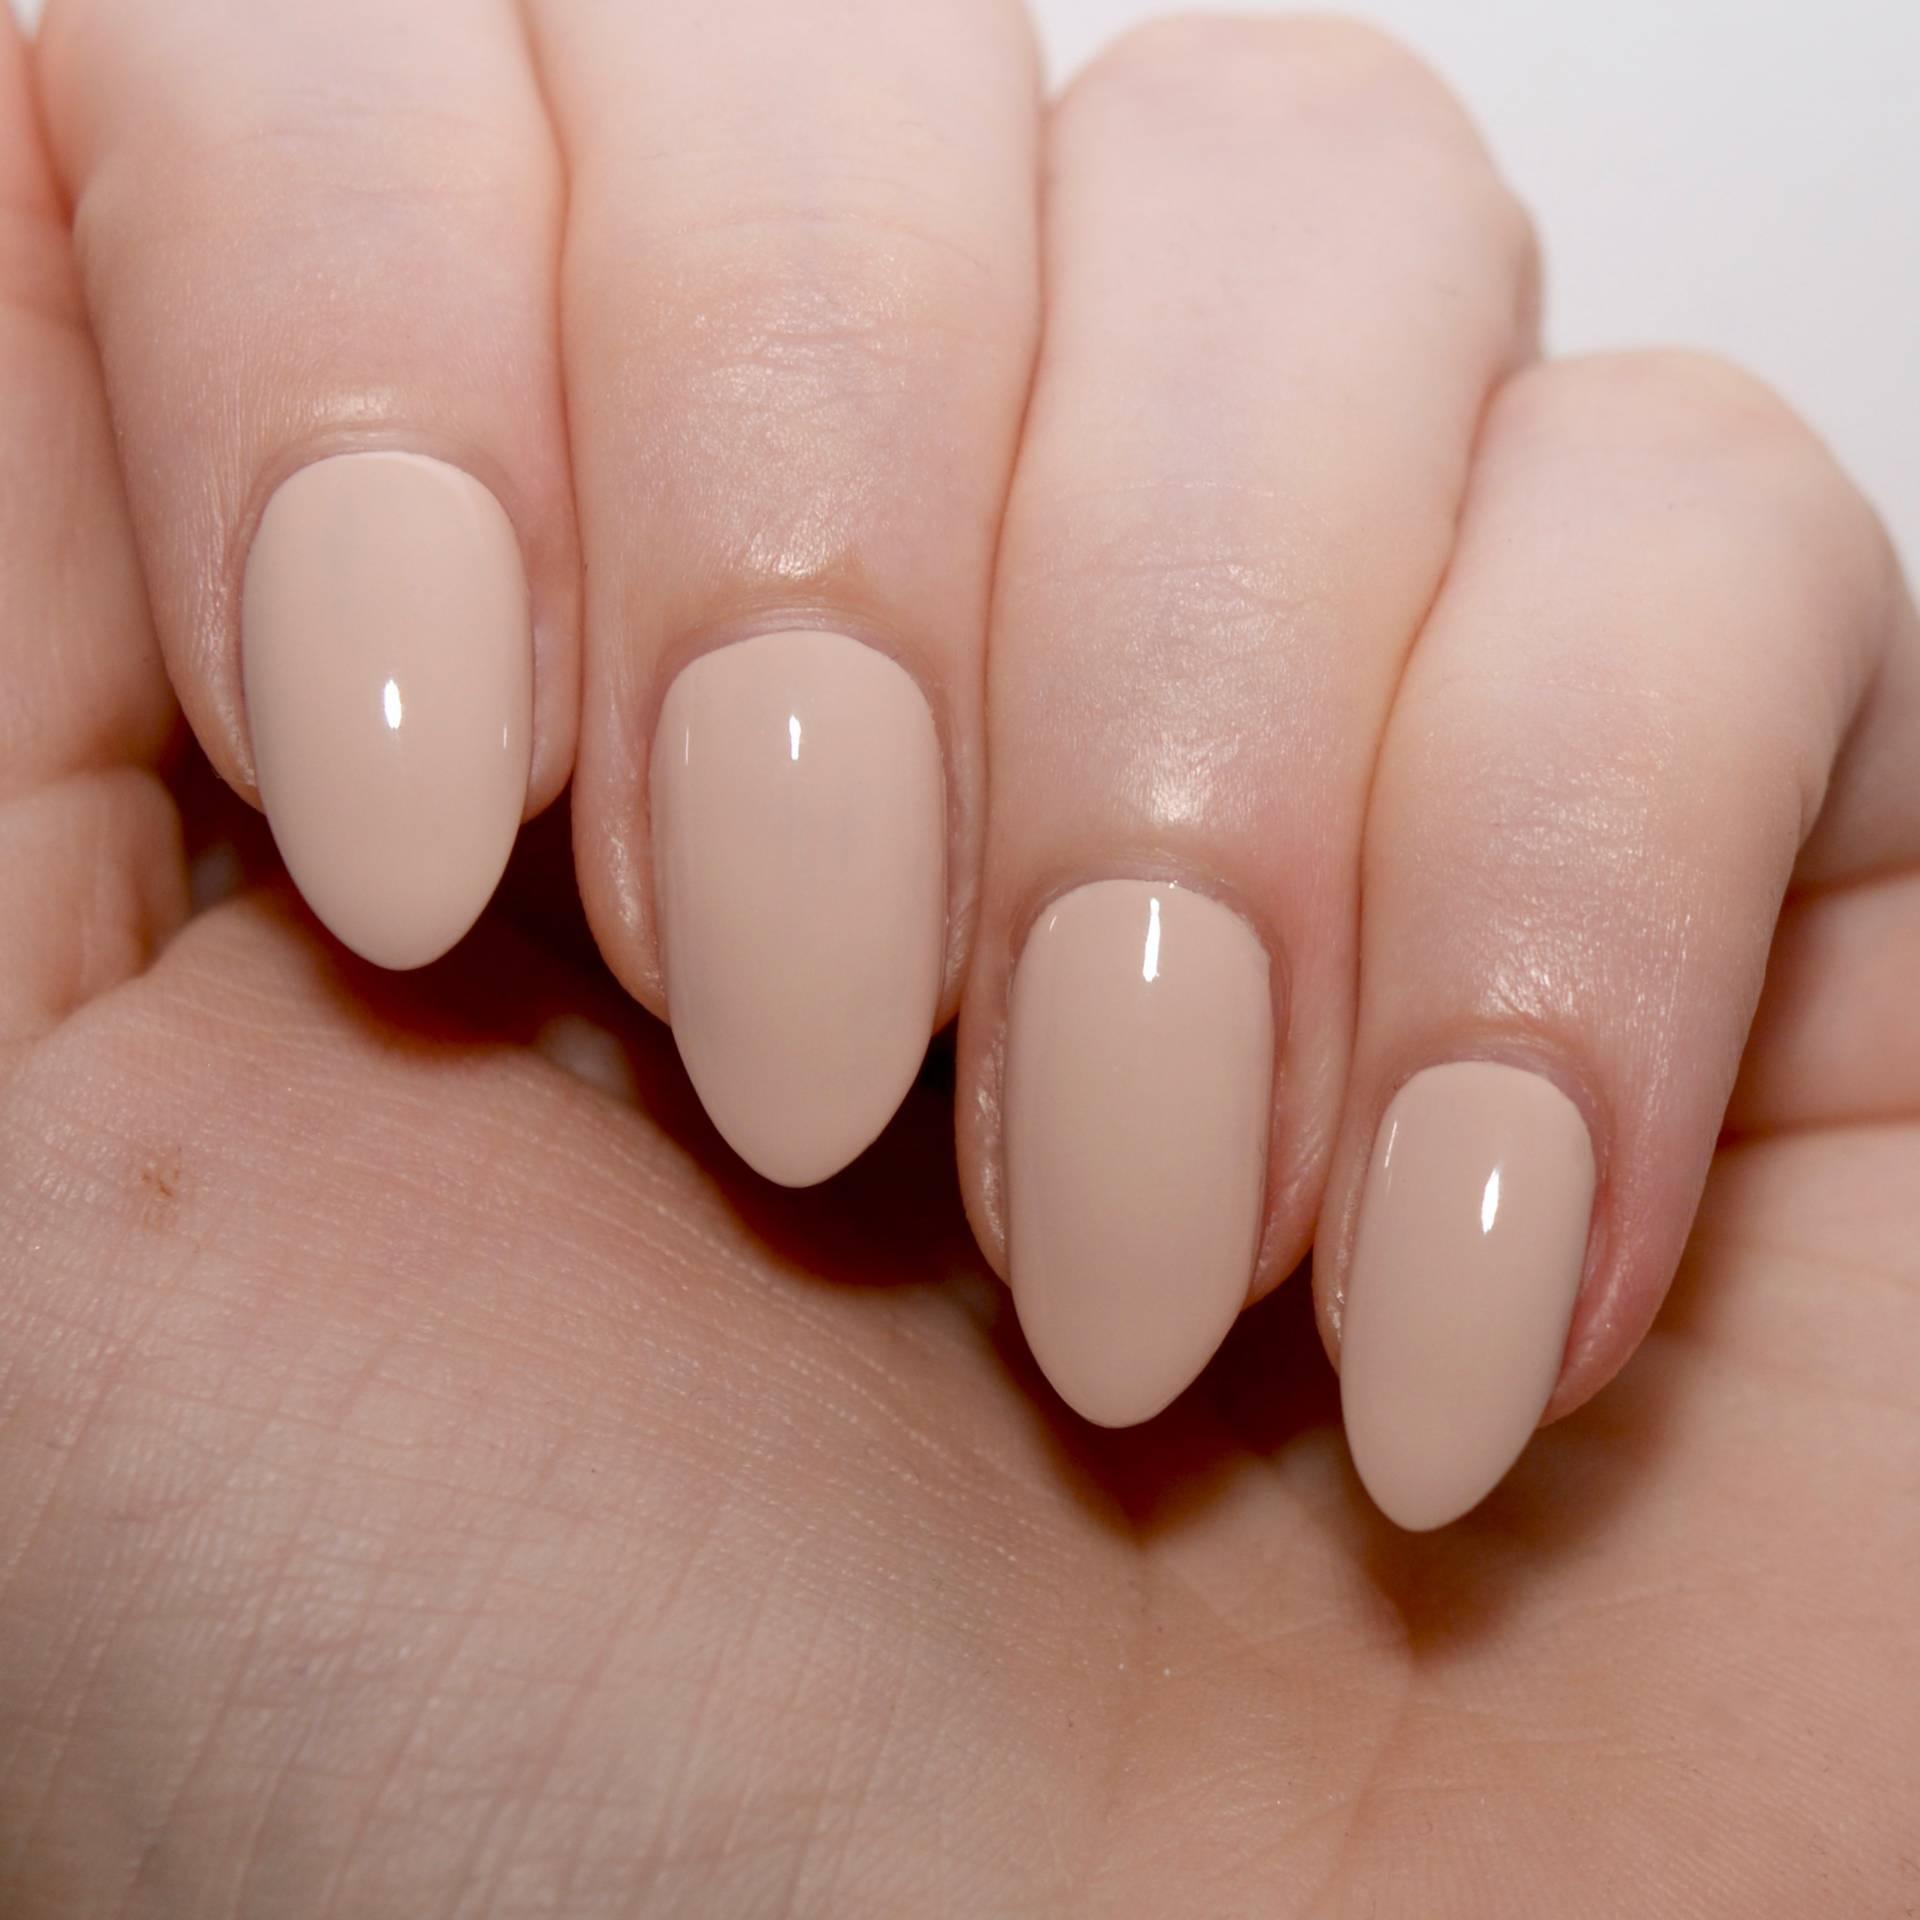 Floss Gloss Dinge - a pale peach toned nude nail varnish.